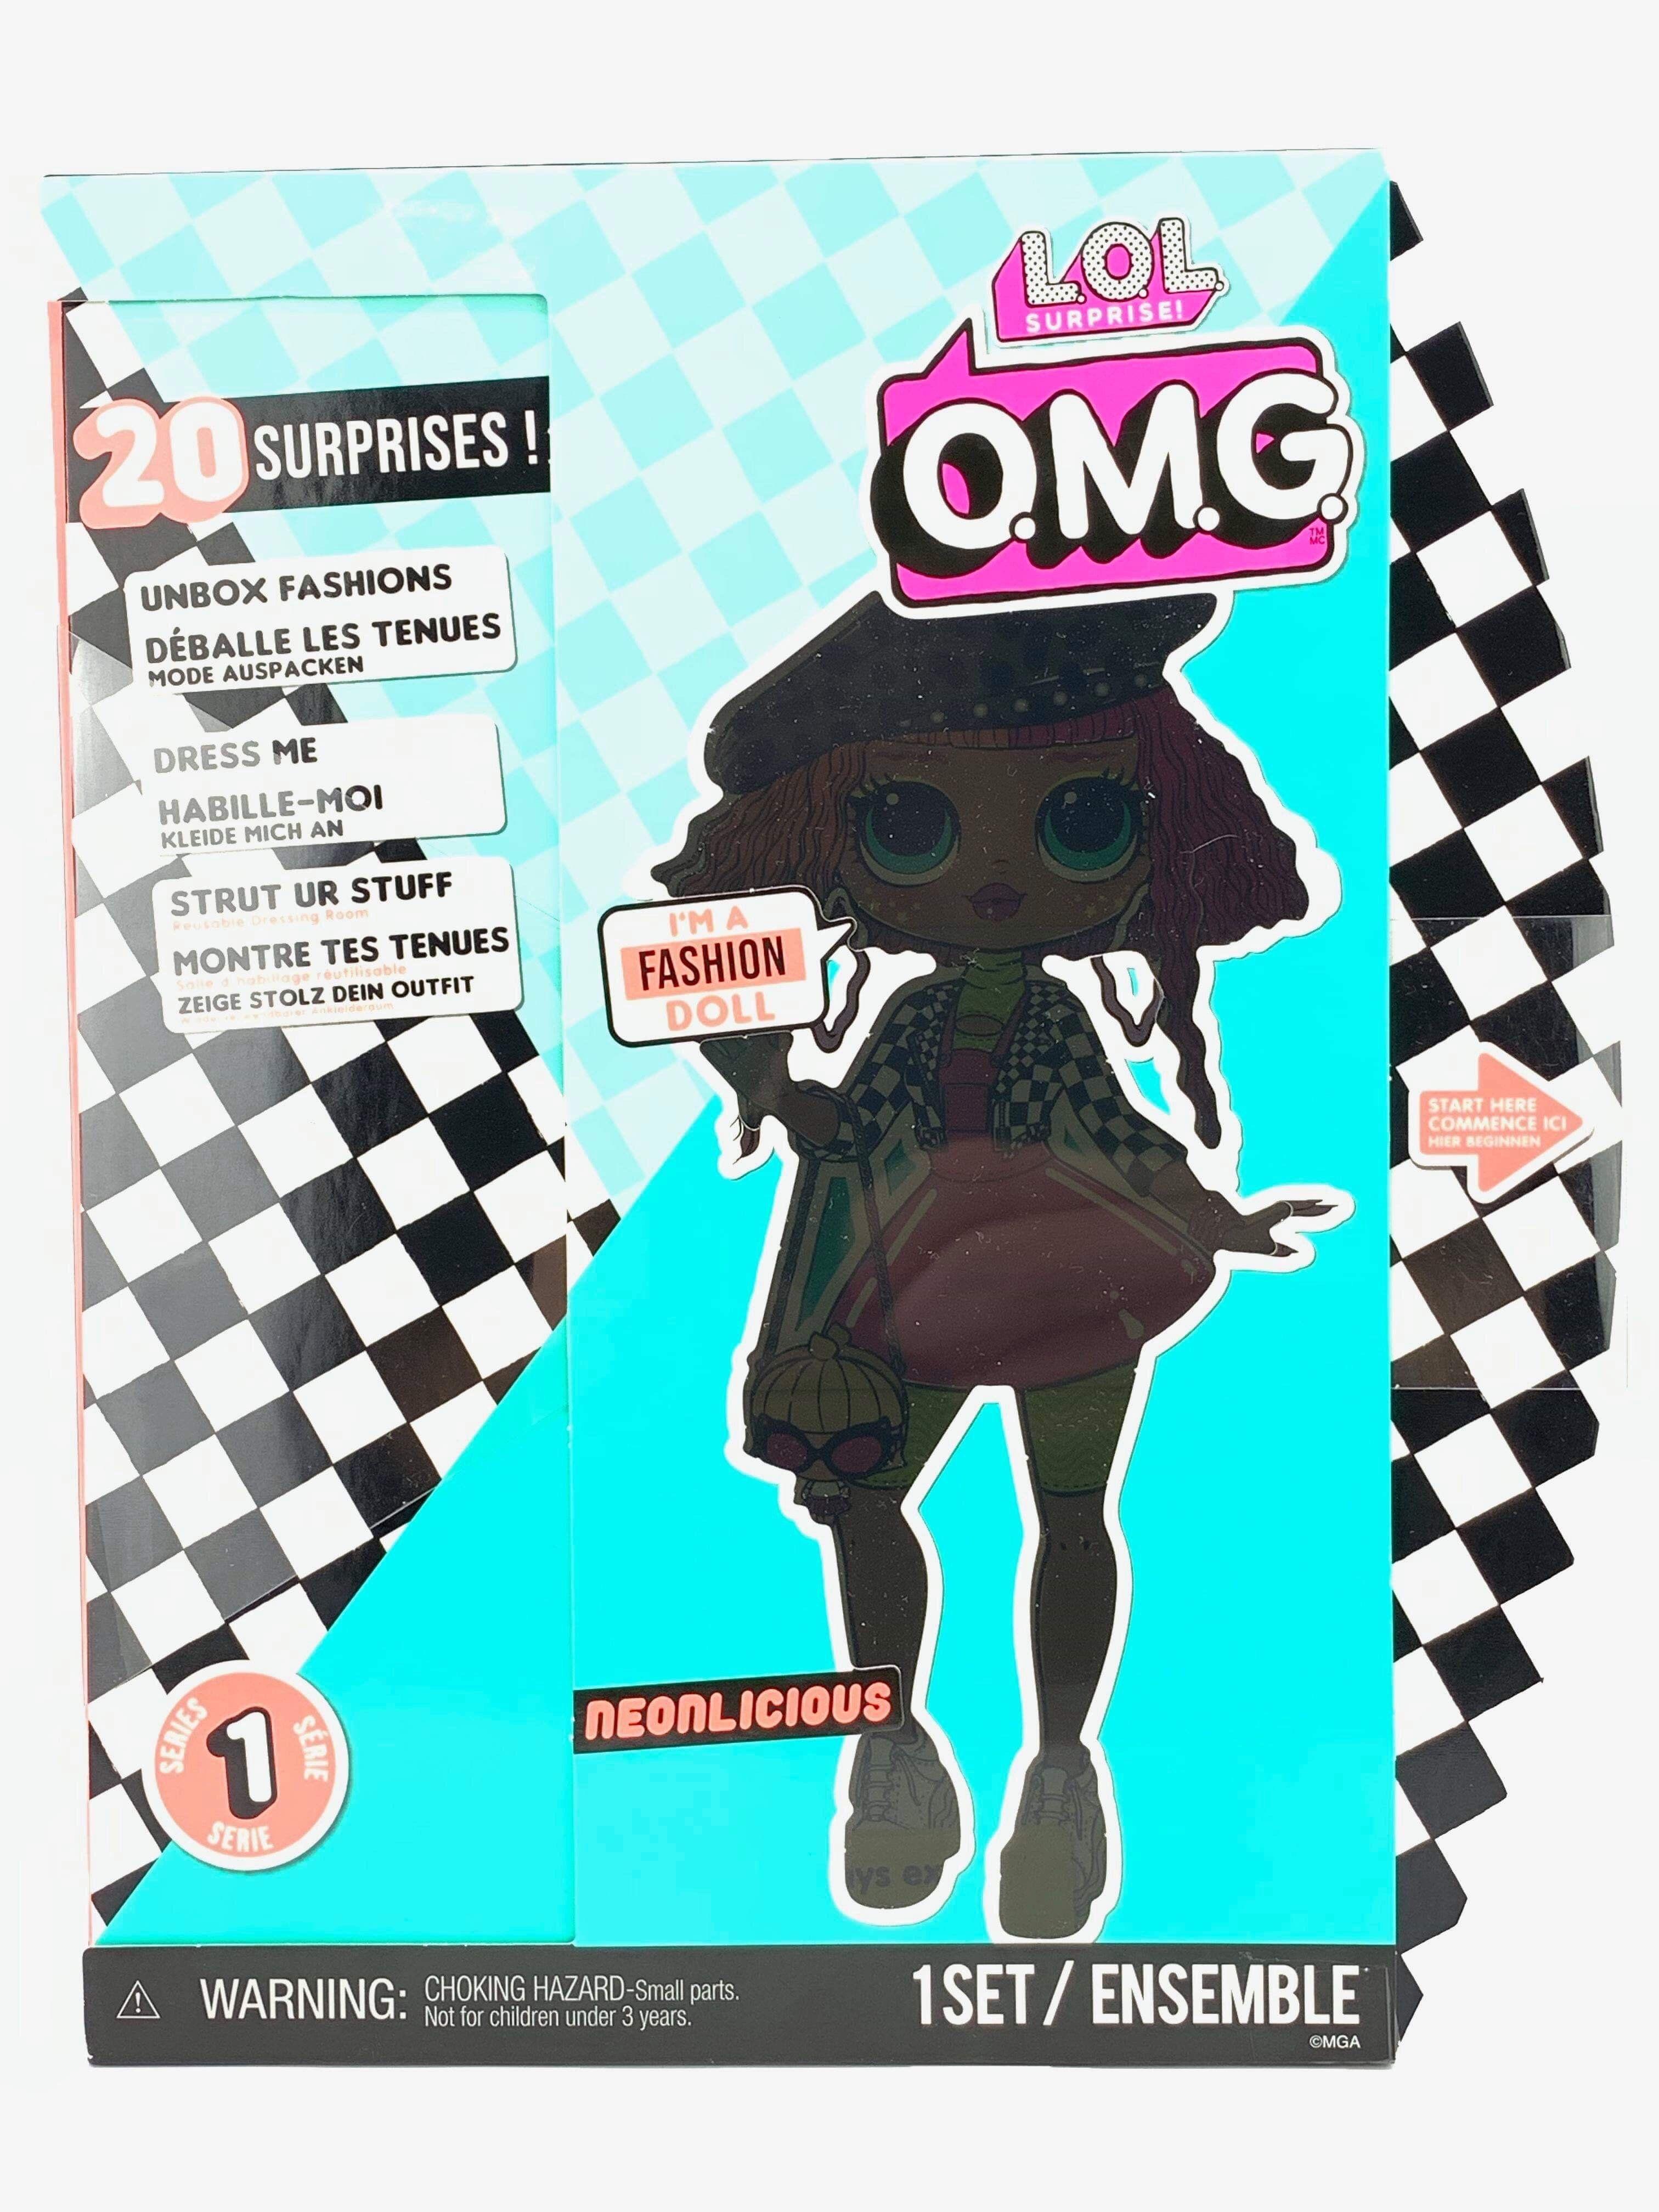 L O L Surprise O M G Neonlicious Fashion Doll With 20 Surprises Lol Omg Lol Dolls Fashion Dolls Lol